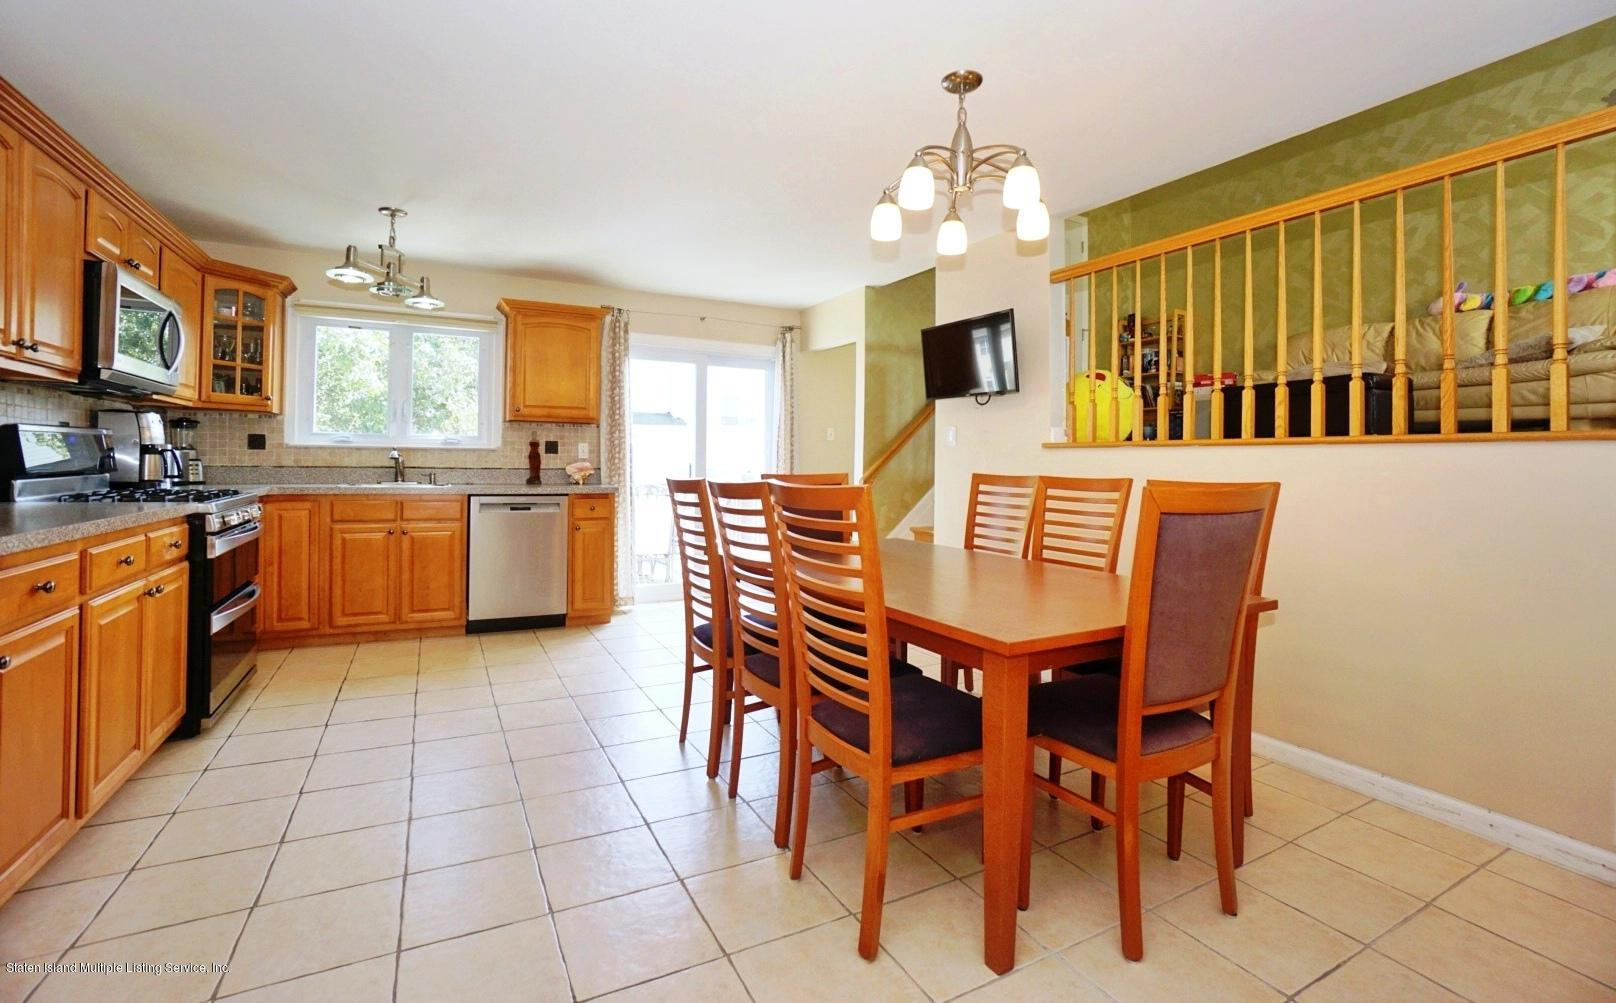 Single Family - Semi-Attached 18 Dunhill Lane  Staten Island, NY 10309, MLS-1139055-9